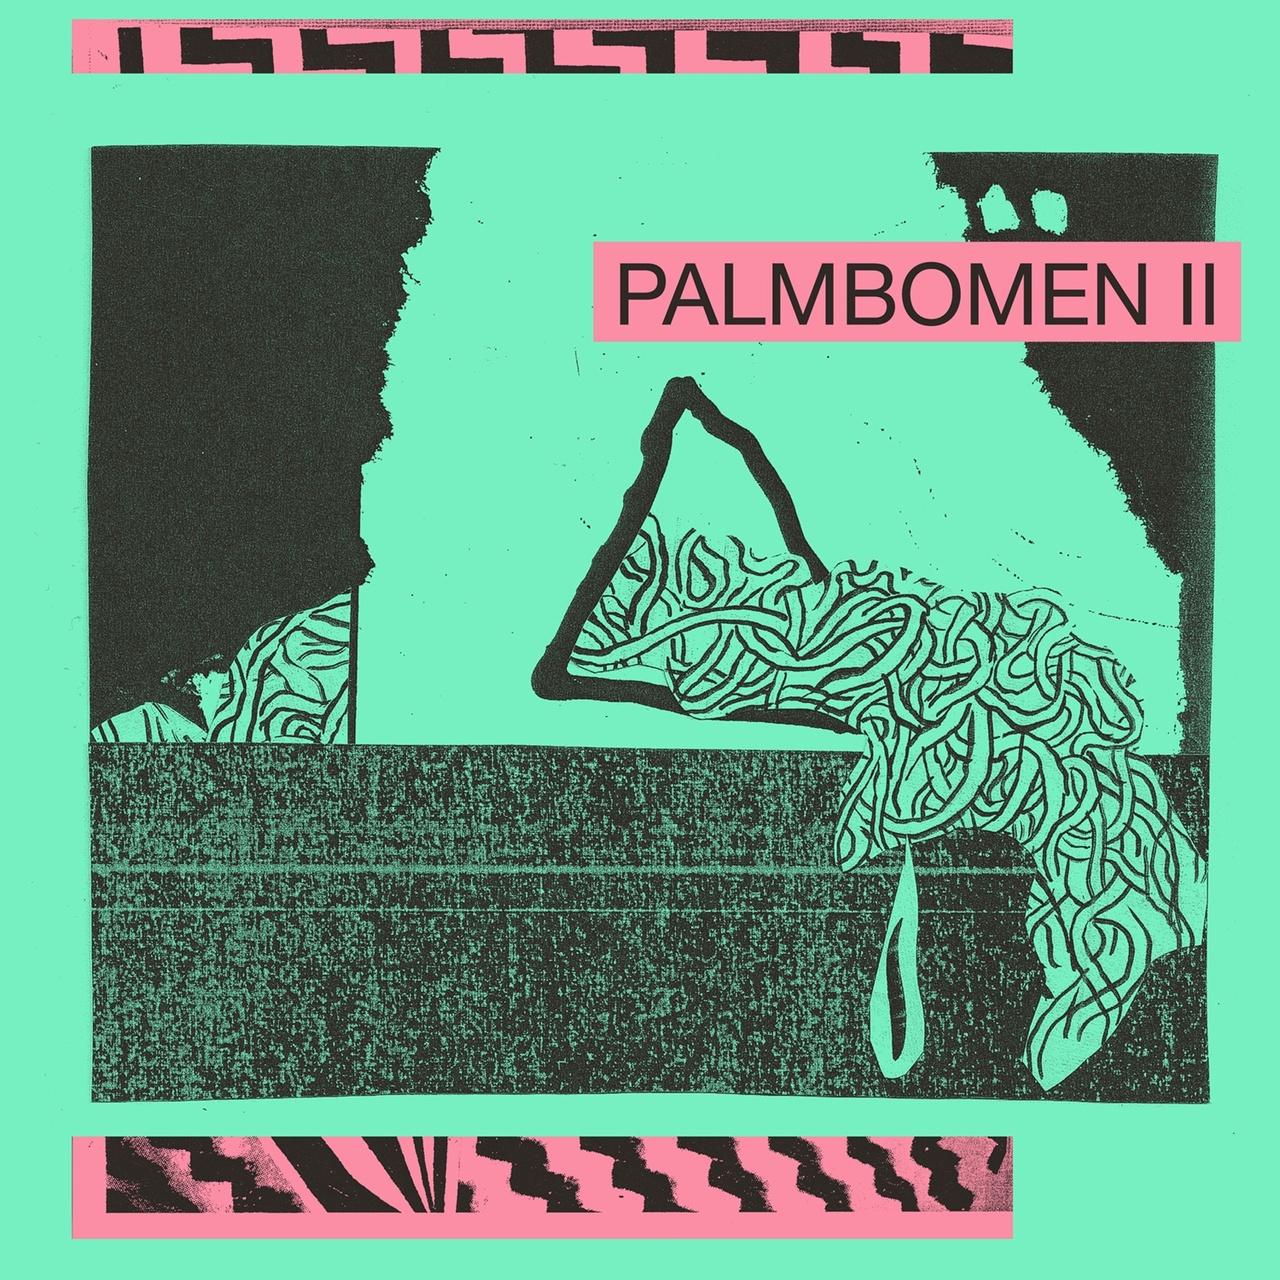 Palmbomen II - Palmbomen II